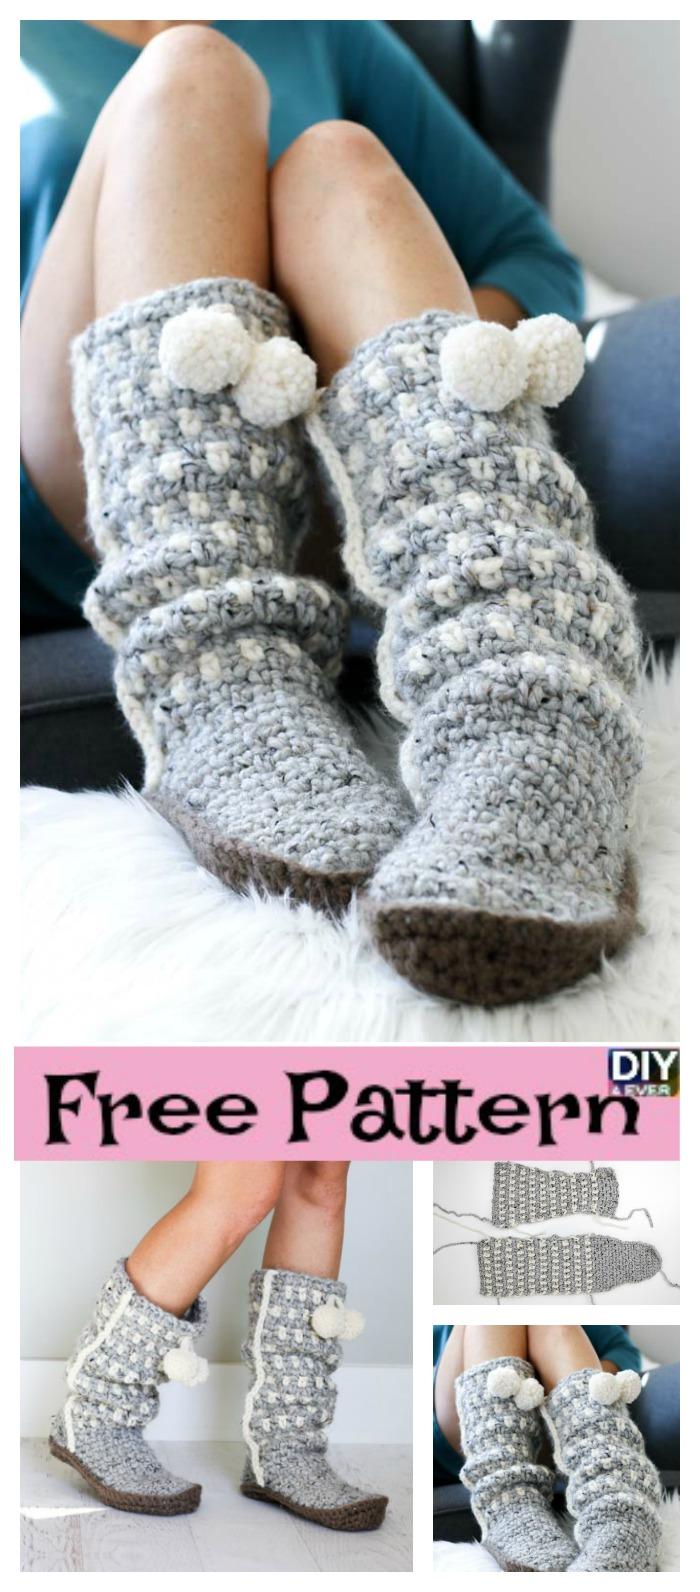 Easy Stylish Crochet Slippers Free Pattern Diy 4 Ever